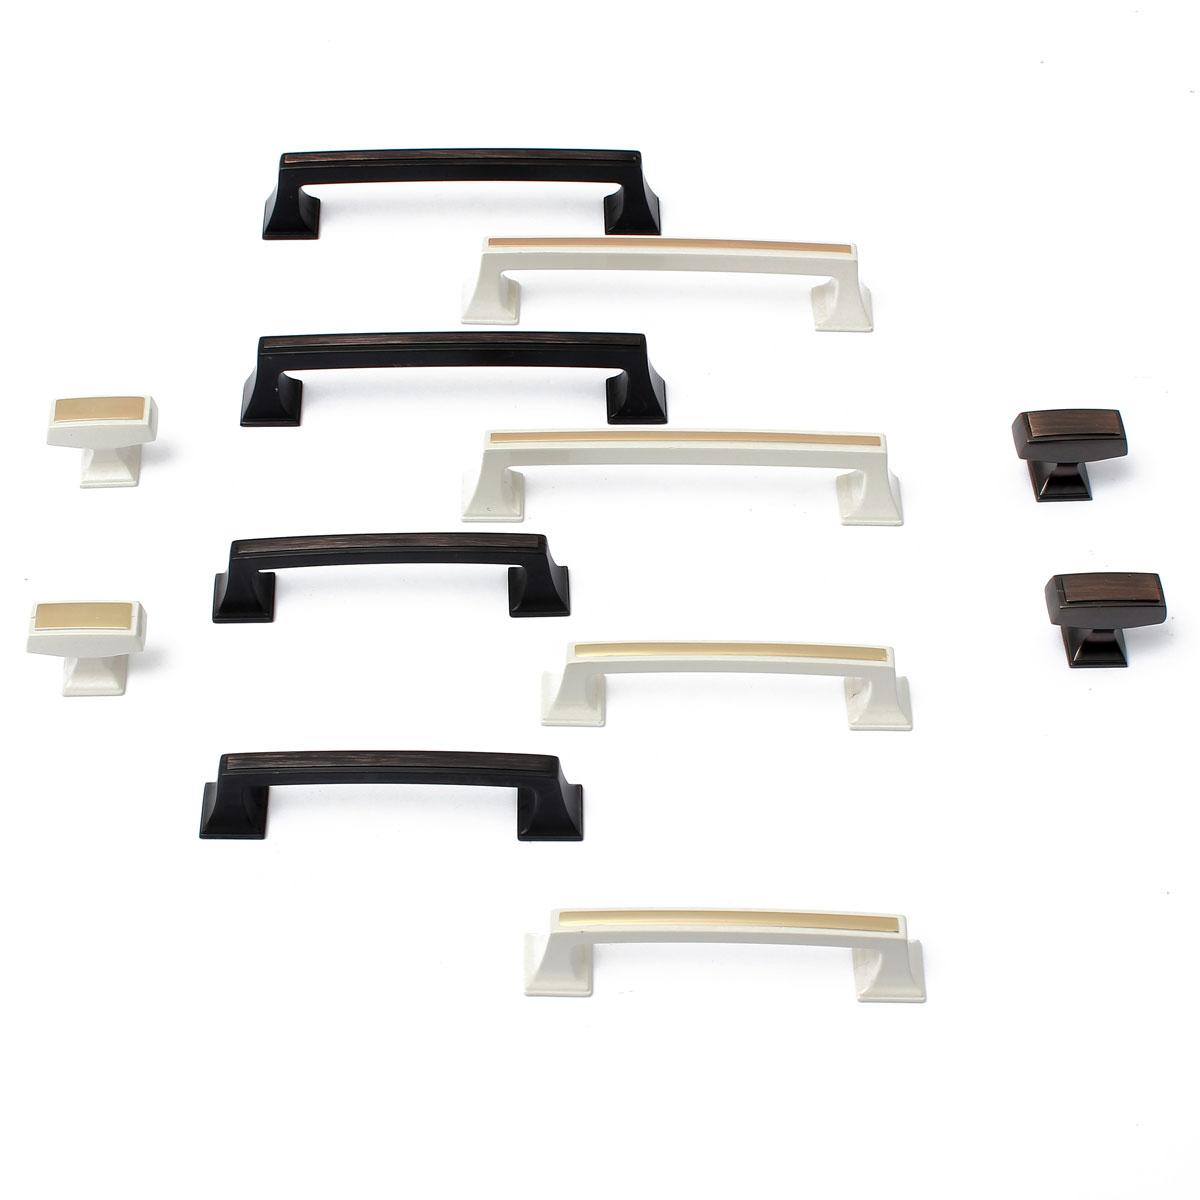 & Hardware > Cabinets & Cabinet Hardware > Cabinet Knobs &a